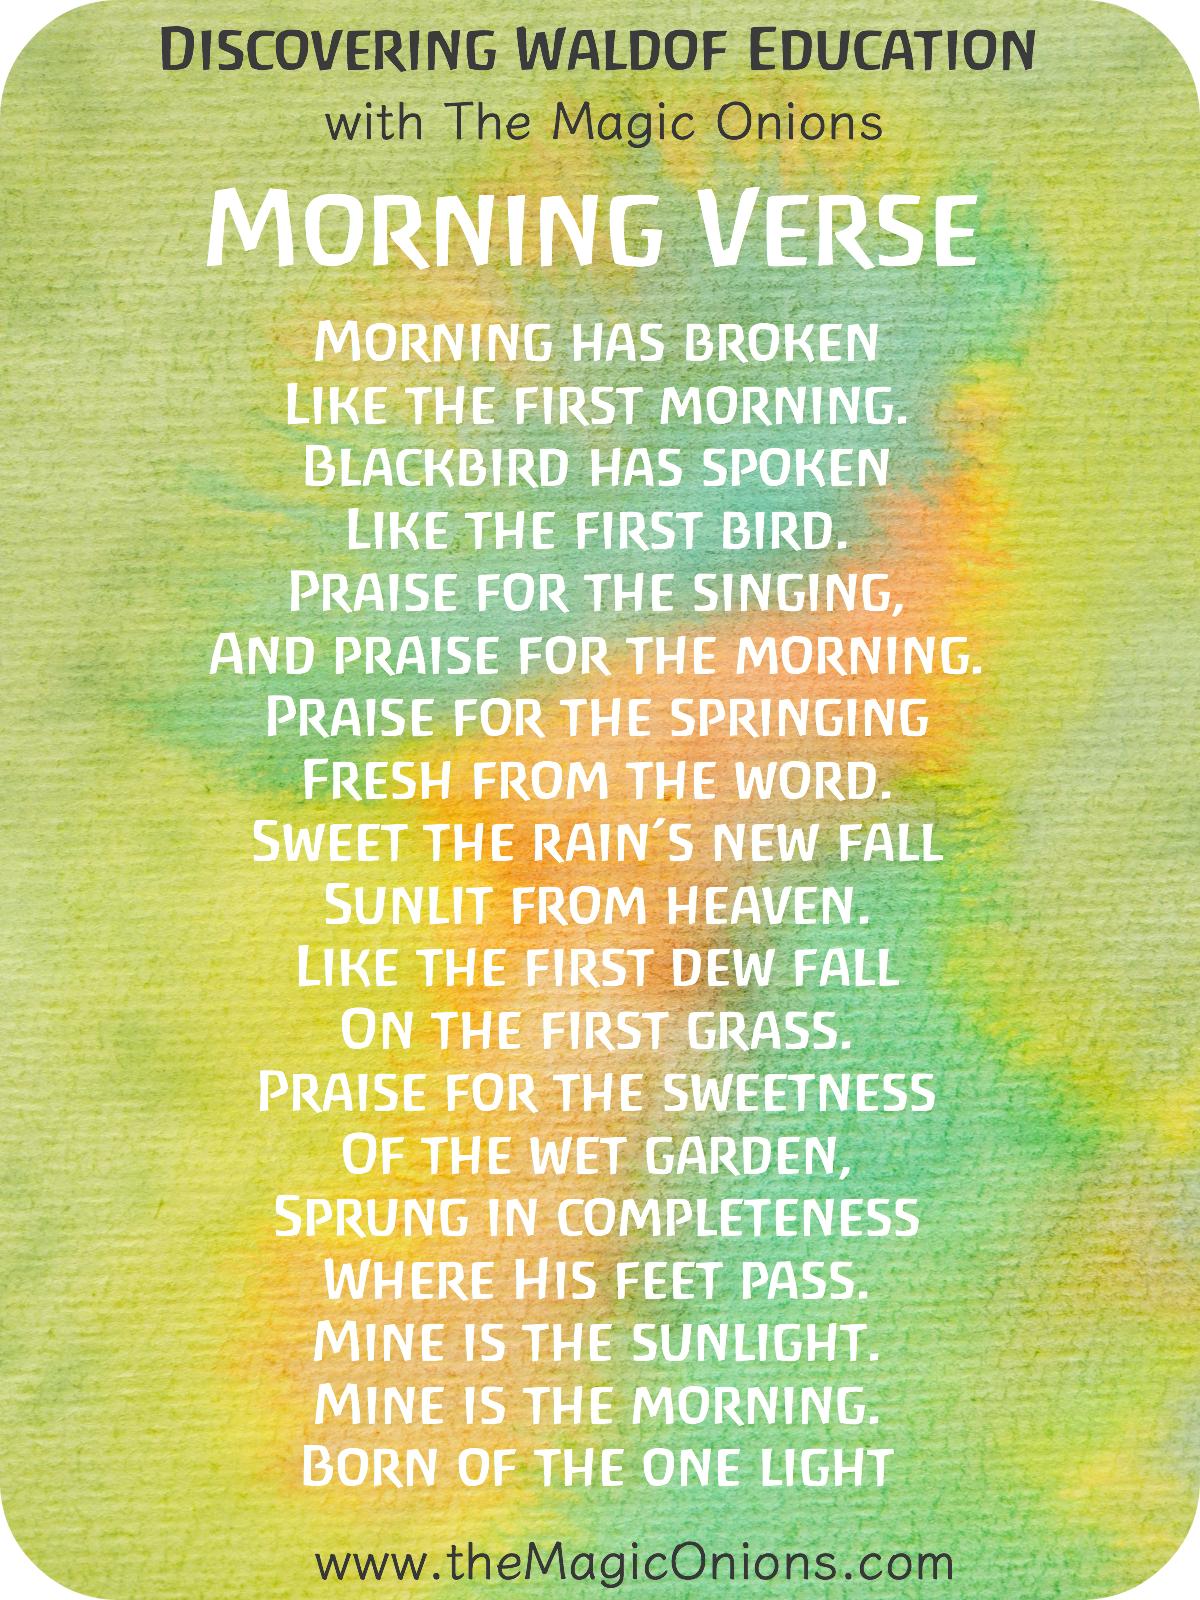 Favorite Waldorf Morning Circle Verses for Kindergarten : Morning has broken, like the first morning